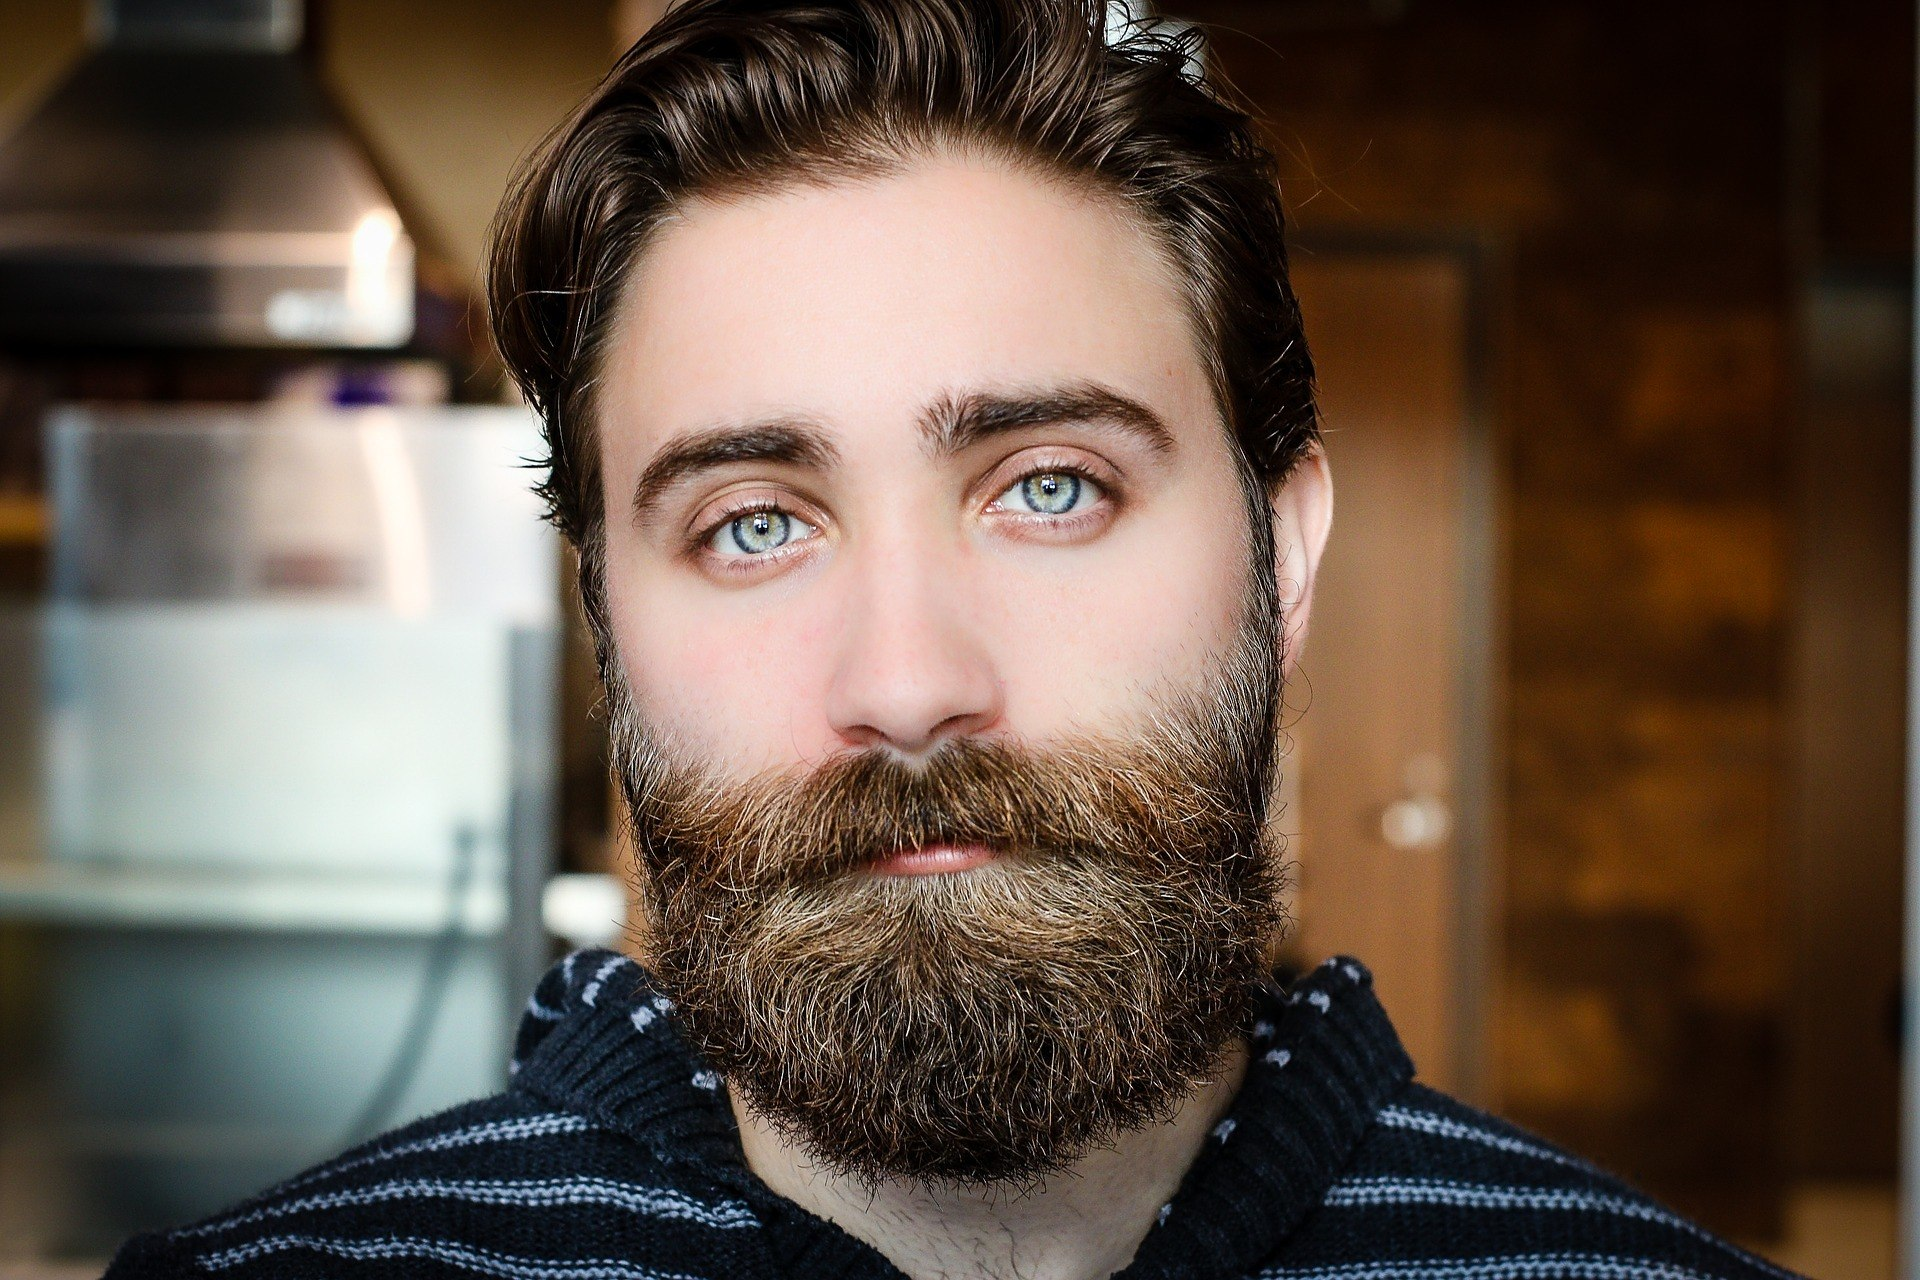 beard face man